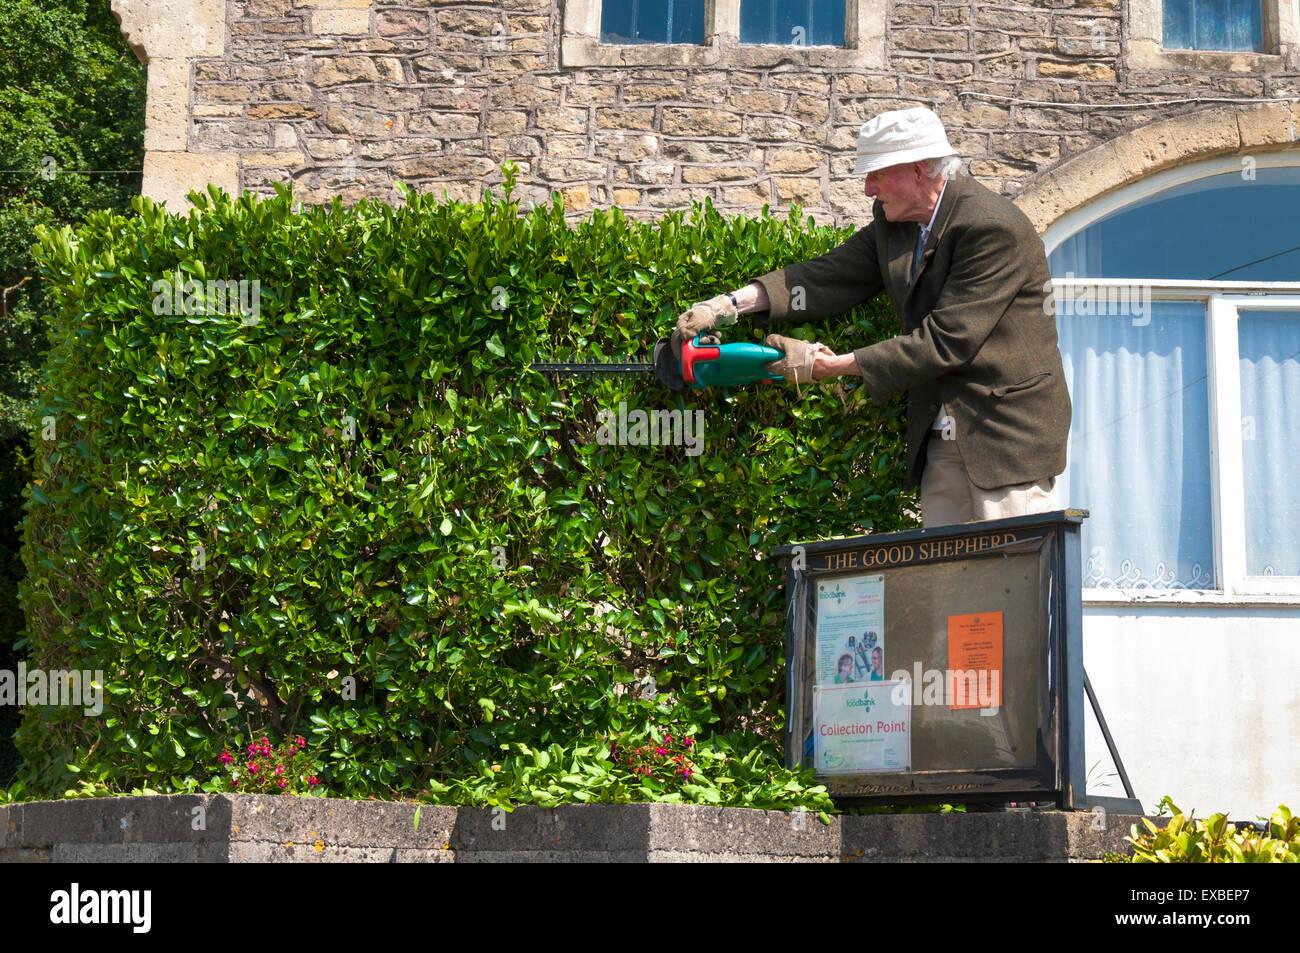 Elderly senior man trims a hedge - Stock Image